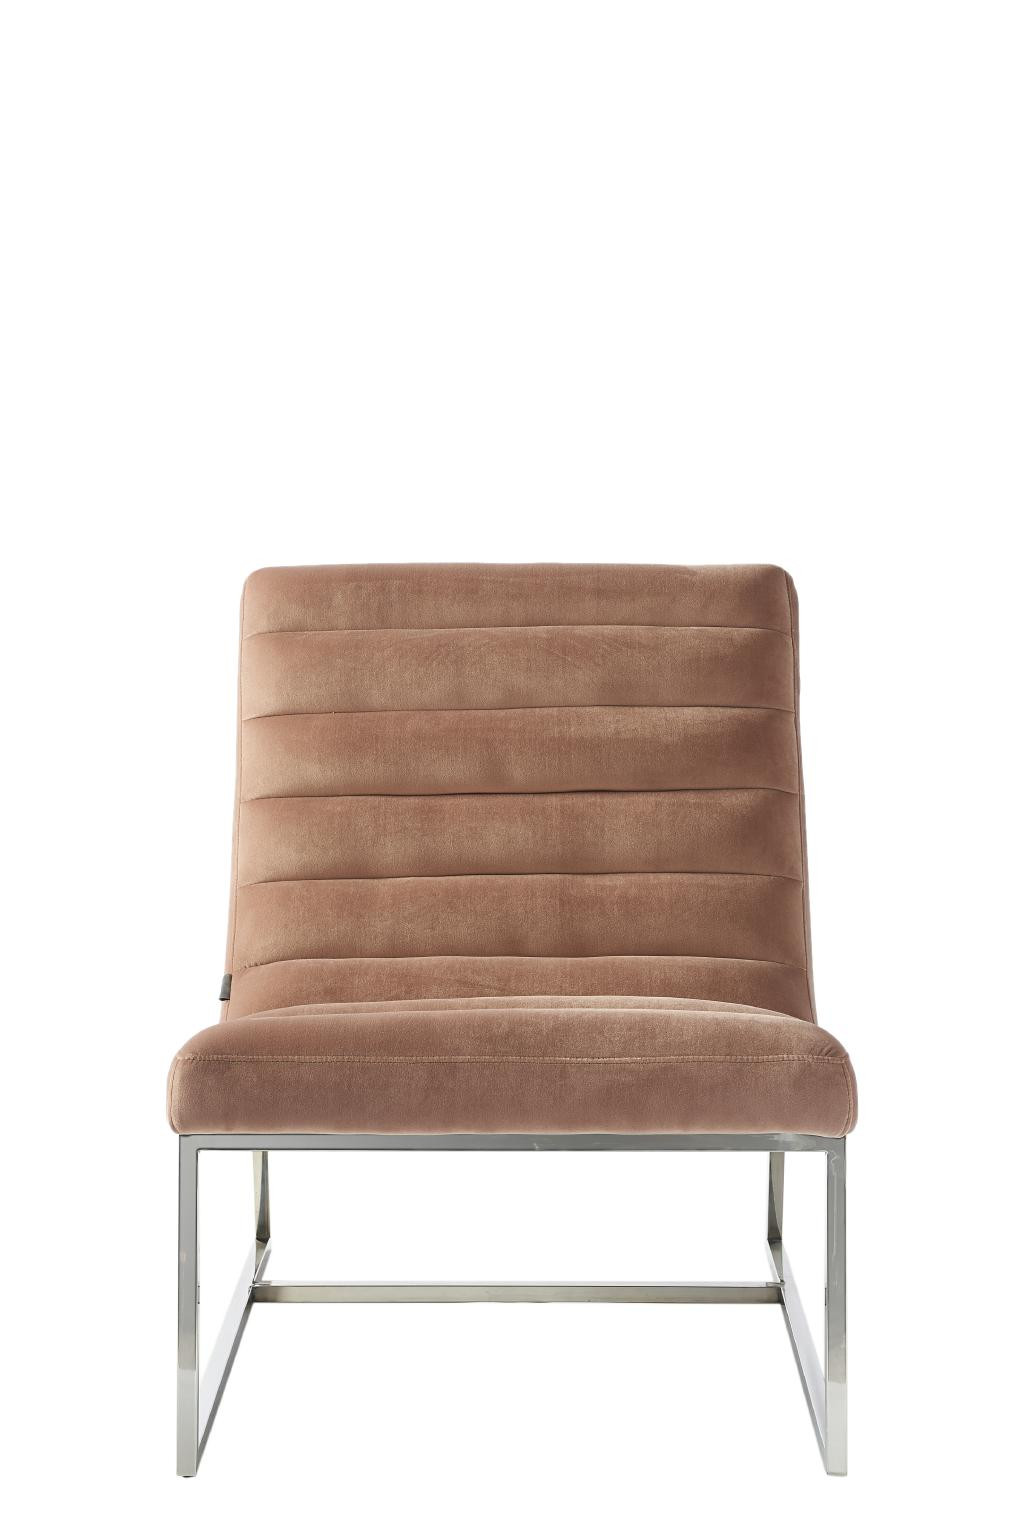 Thompson Lounge Chair, velvet, blush / Rivièra Maison